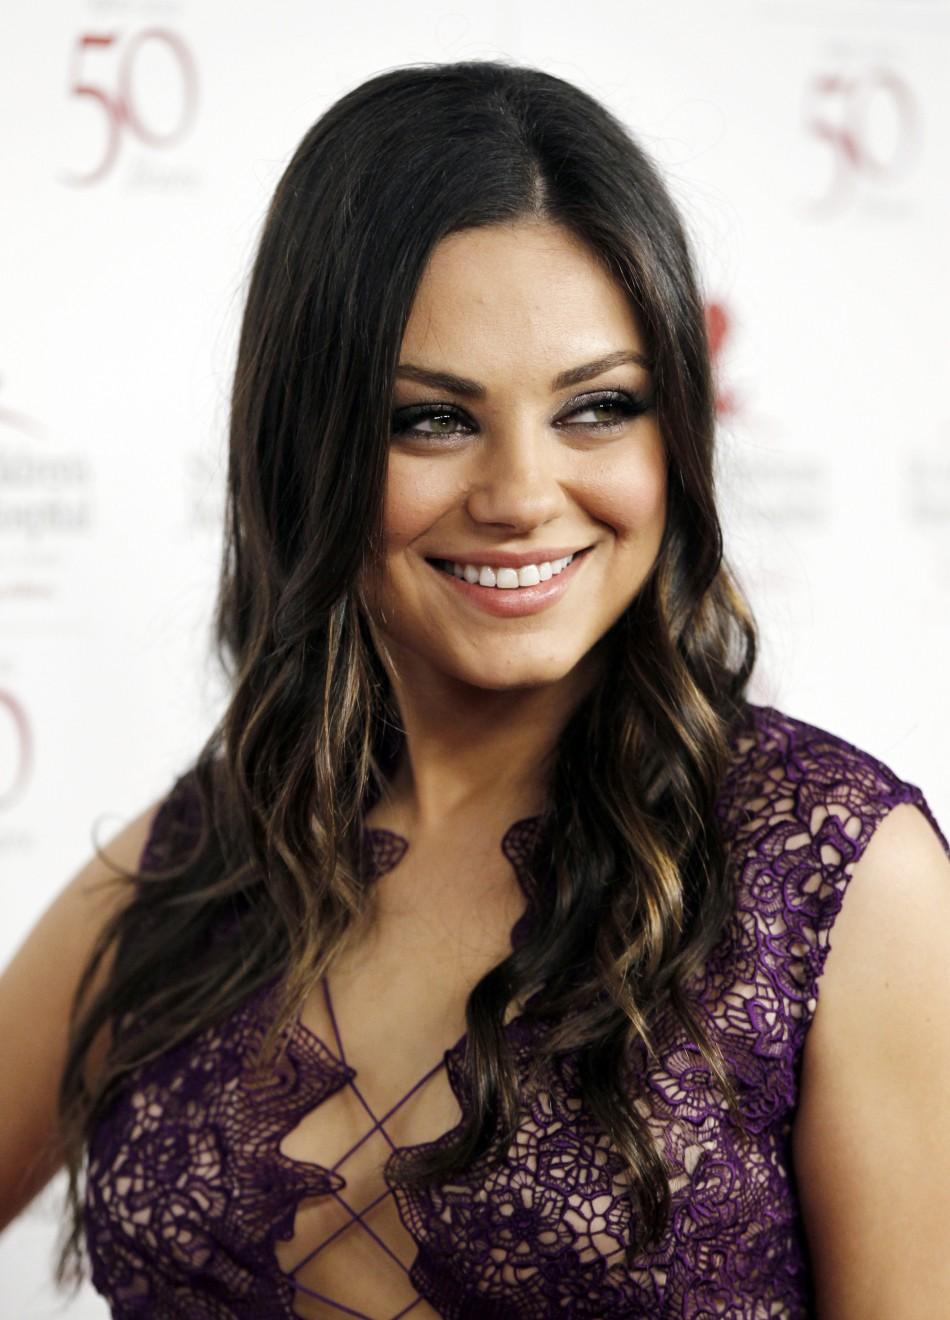 Mila Kunis Saves Man's Life During Violent Seizure In her Home